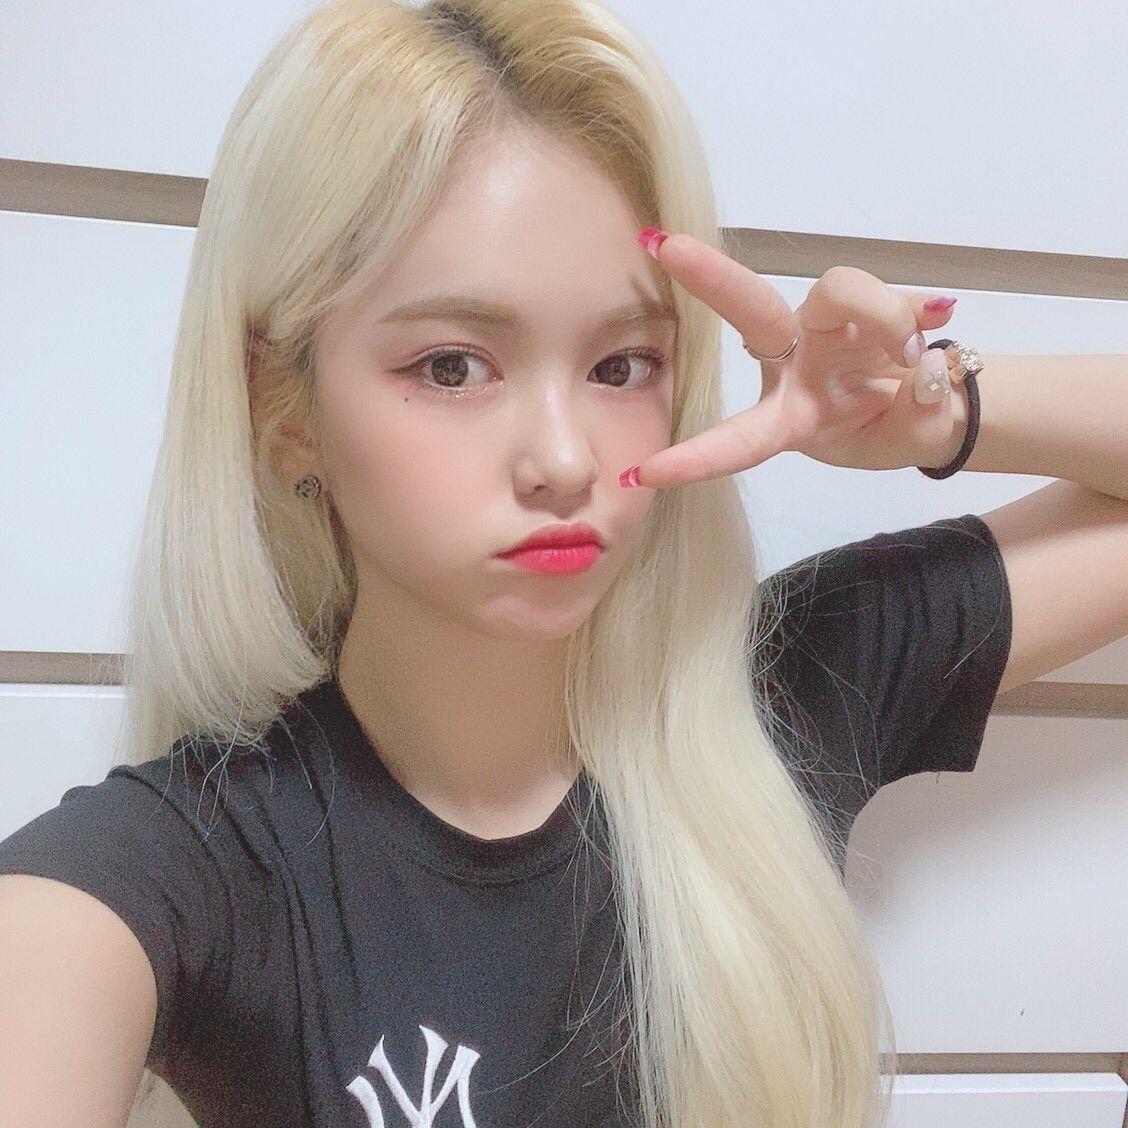 Pin By Coco On Kpop Idols Korean Girl Groups Aisha Kpop Girls